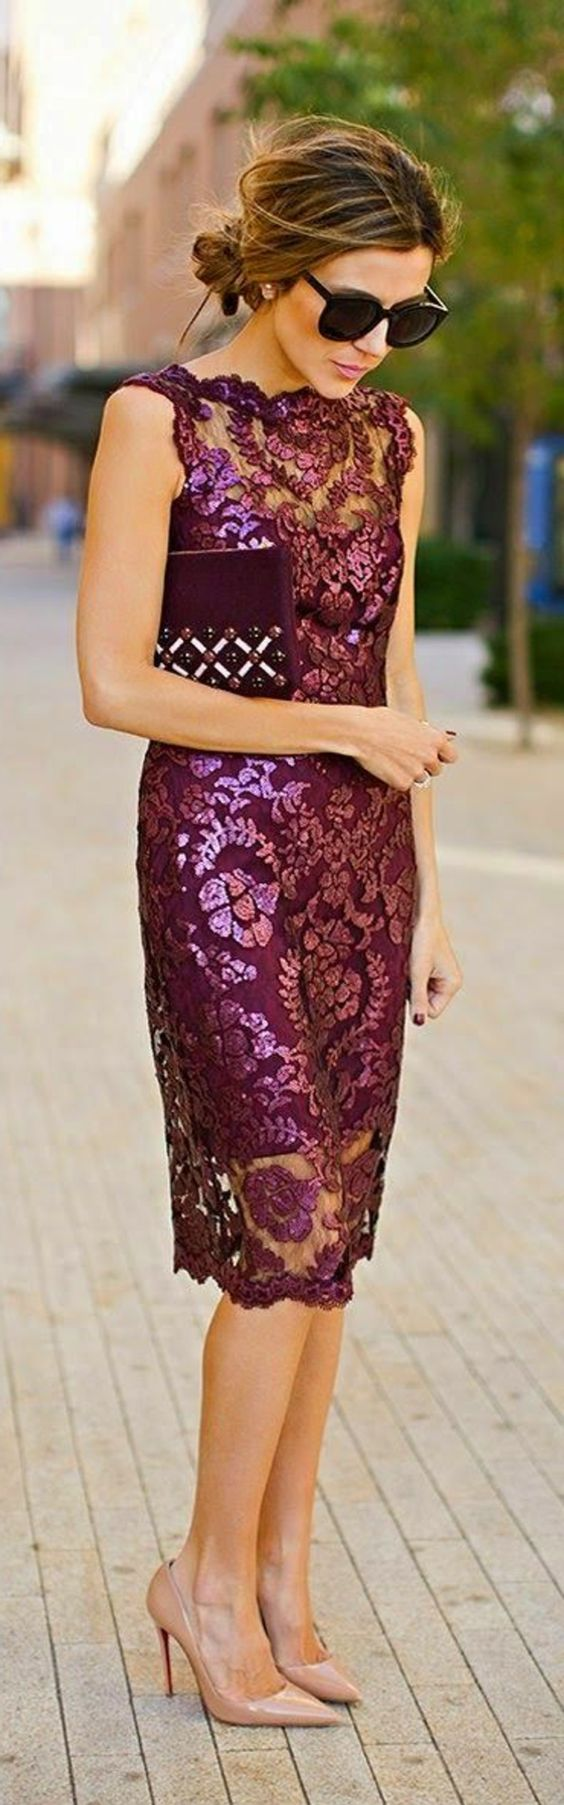 jolie robe habillee en dentelle violet et talons hauts: